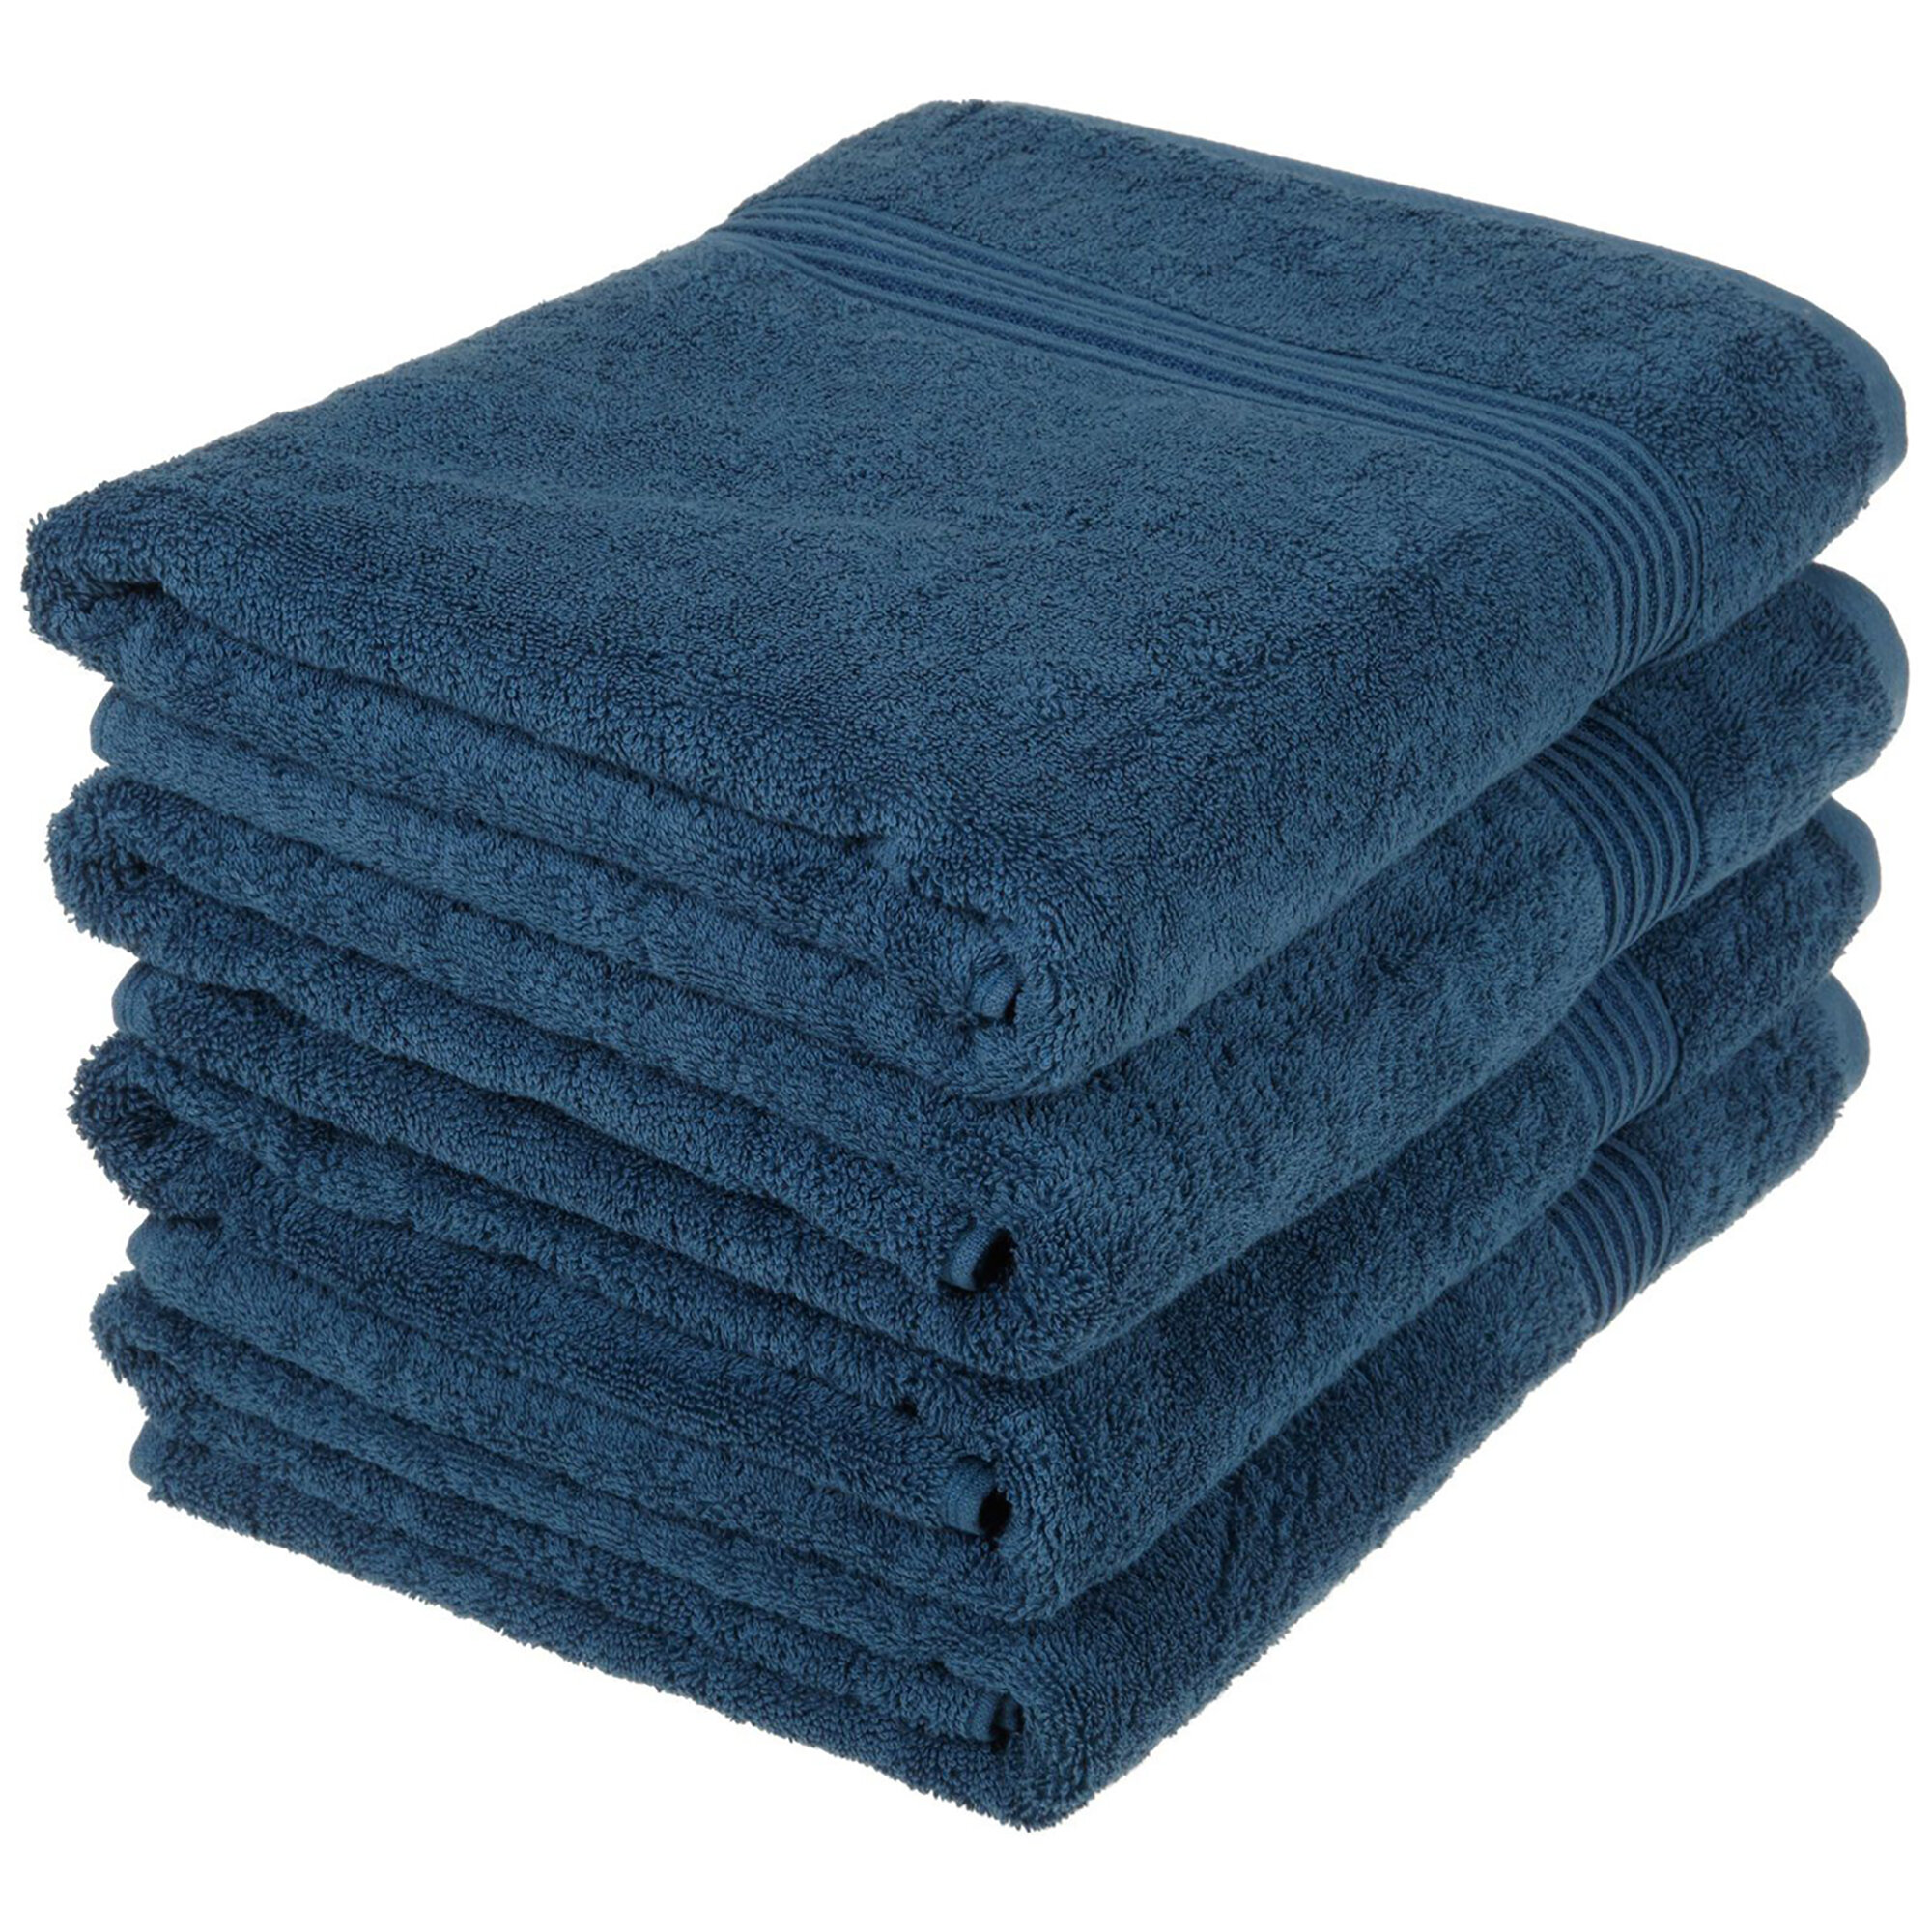 335b06b987 The Twillery Co. Patric 4 Piece Bath Towel Set   Reviews